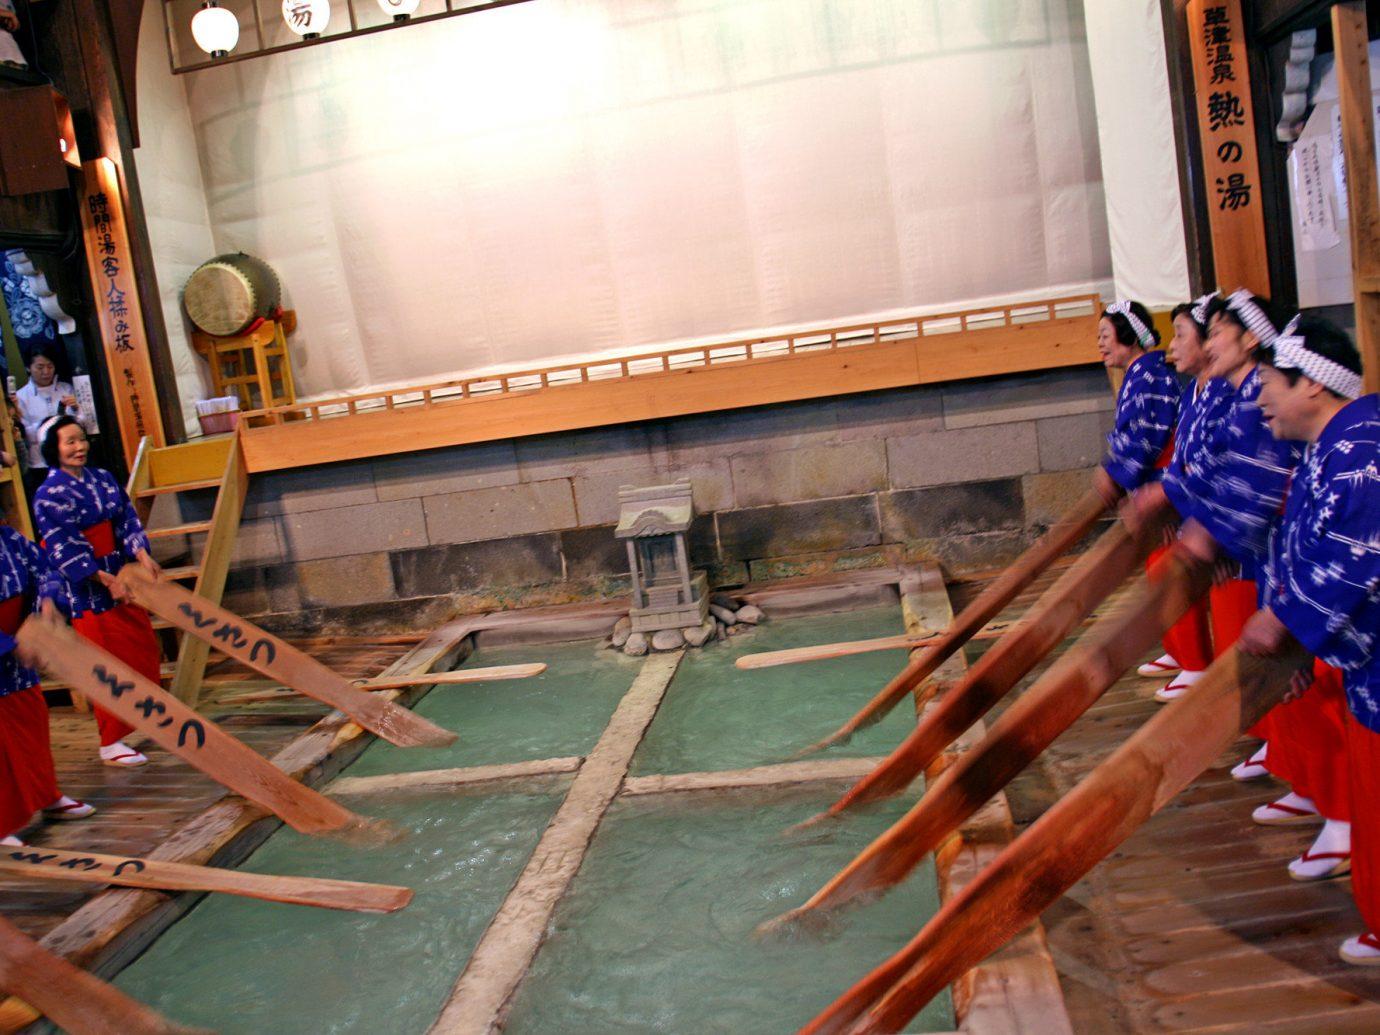 Day Trips indoor leisure wooden tourist attraction recreation fun Raft